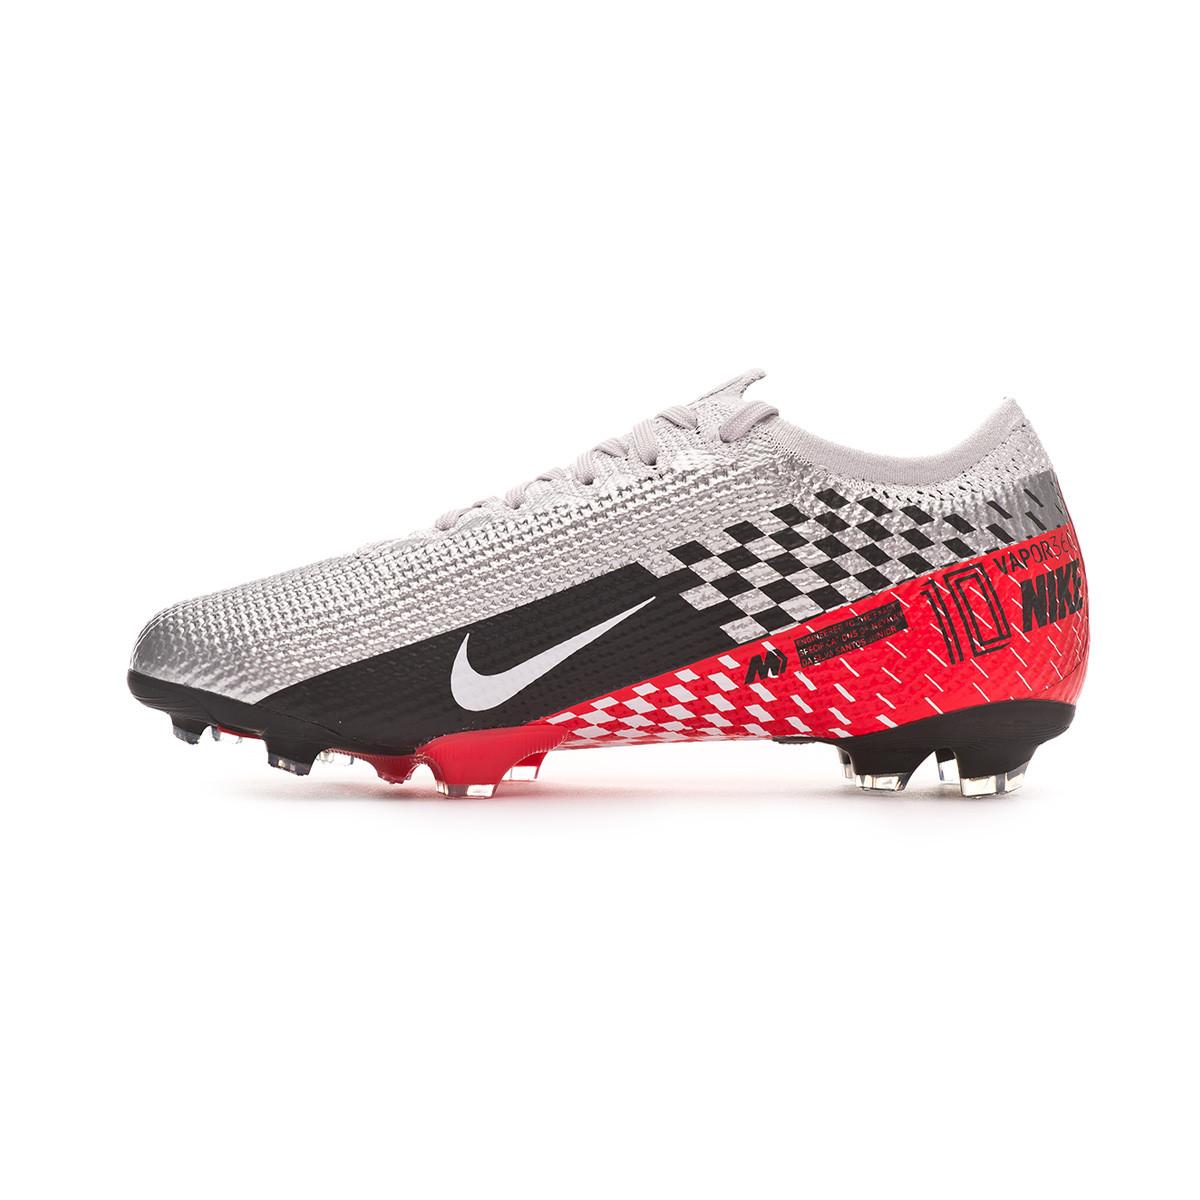 order online 100% top quality hot products Nike Kids Mercurial Vapor XIII Elite FG Neymar Jr Football Boots